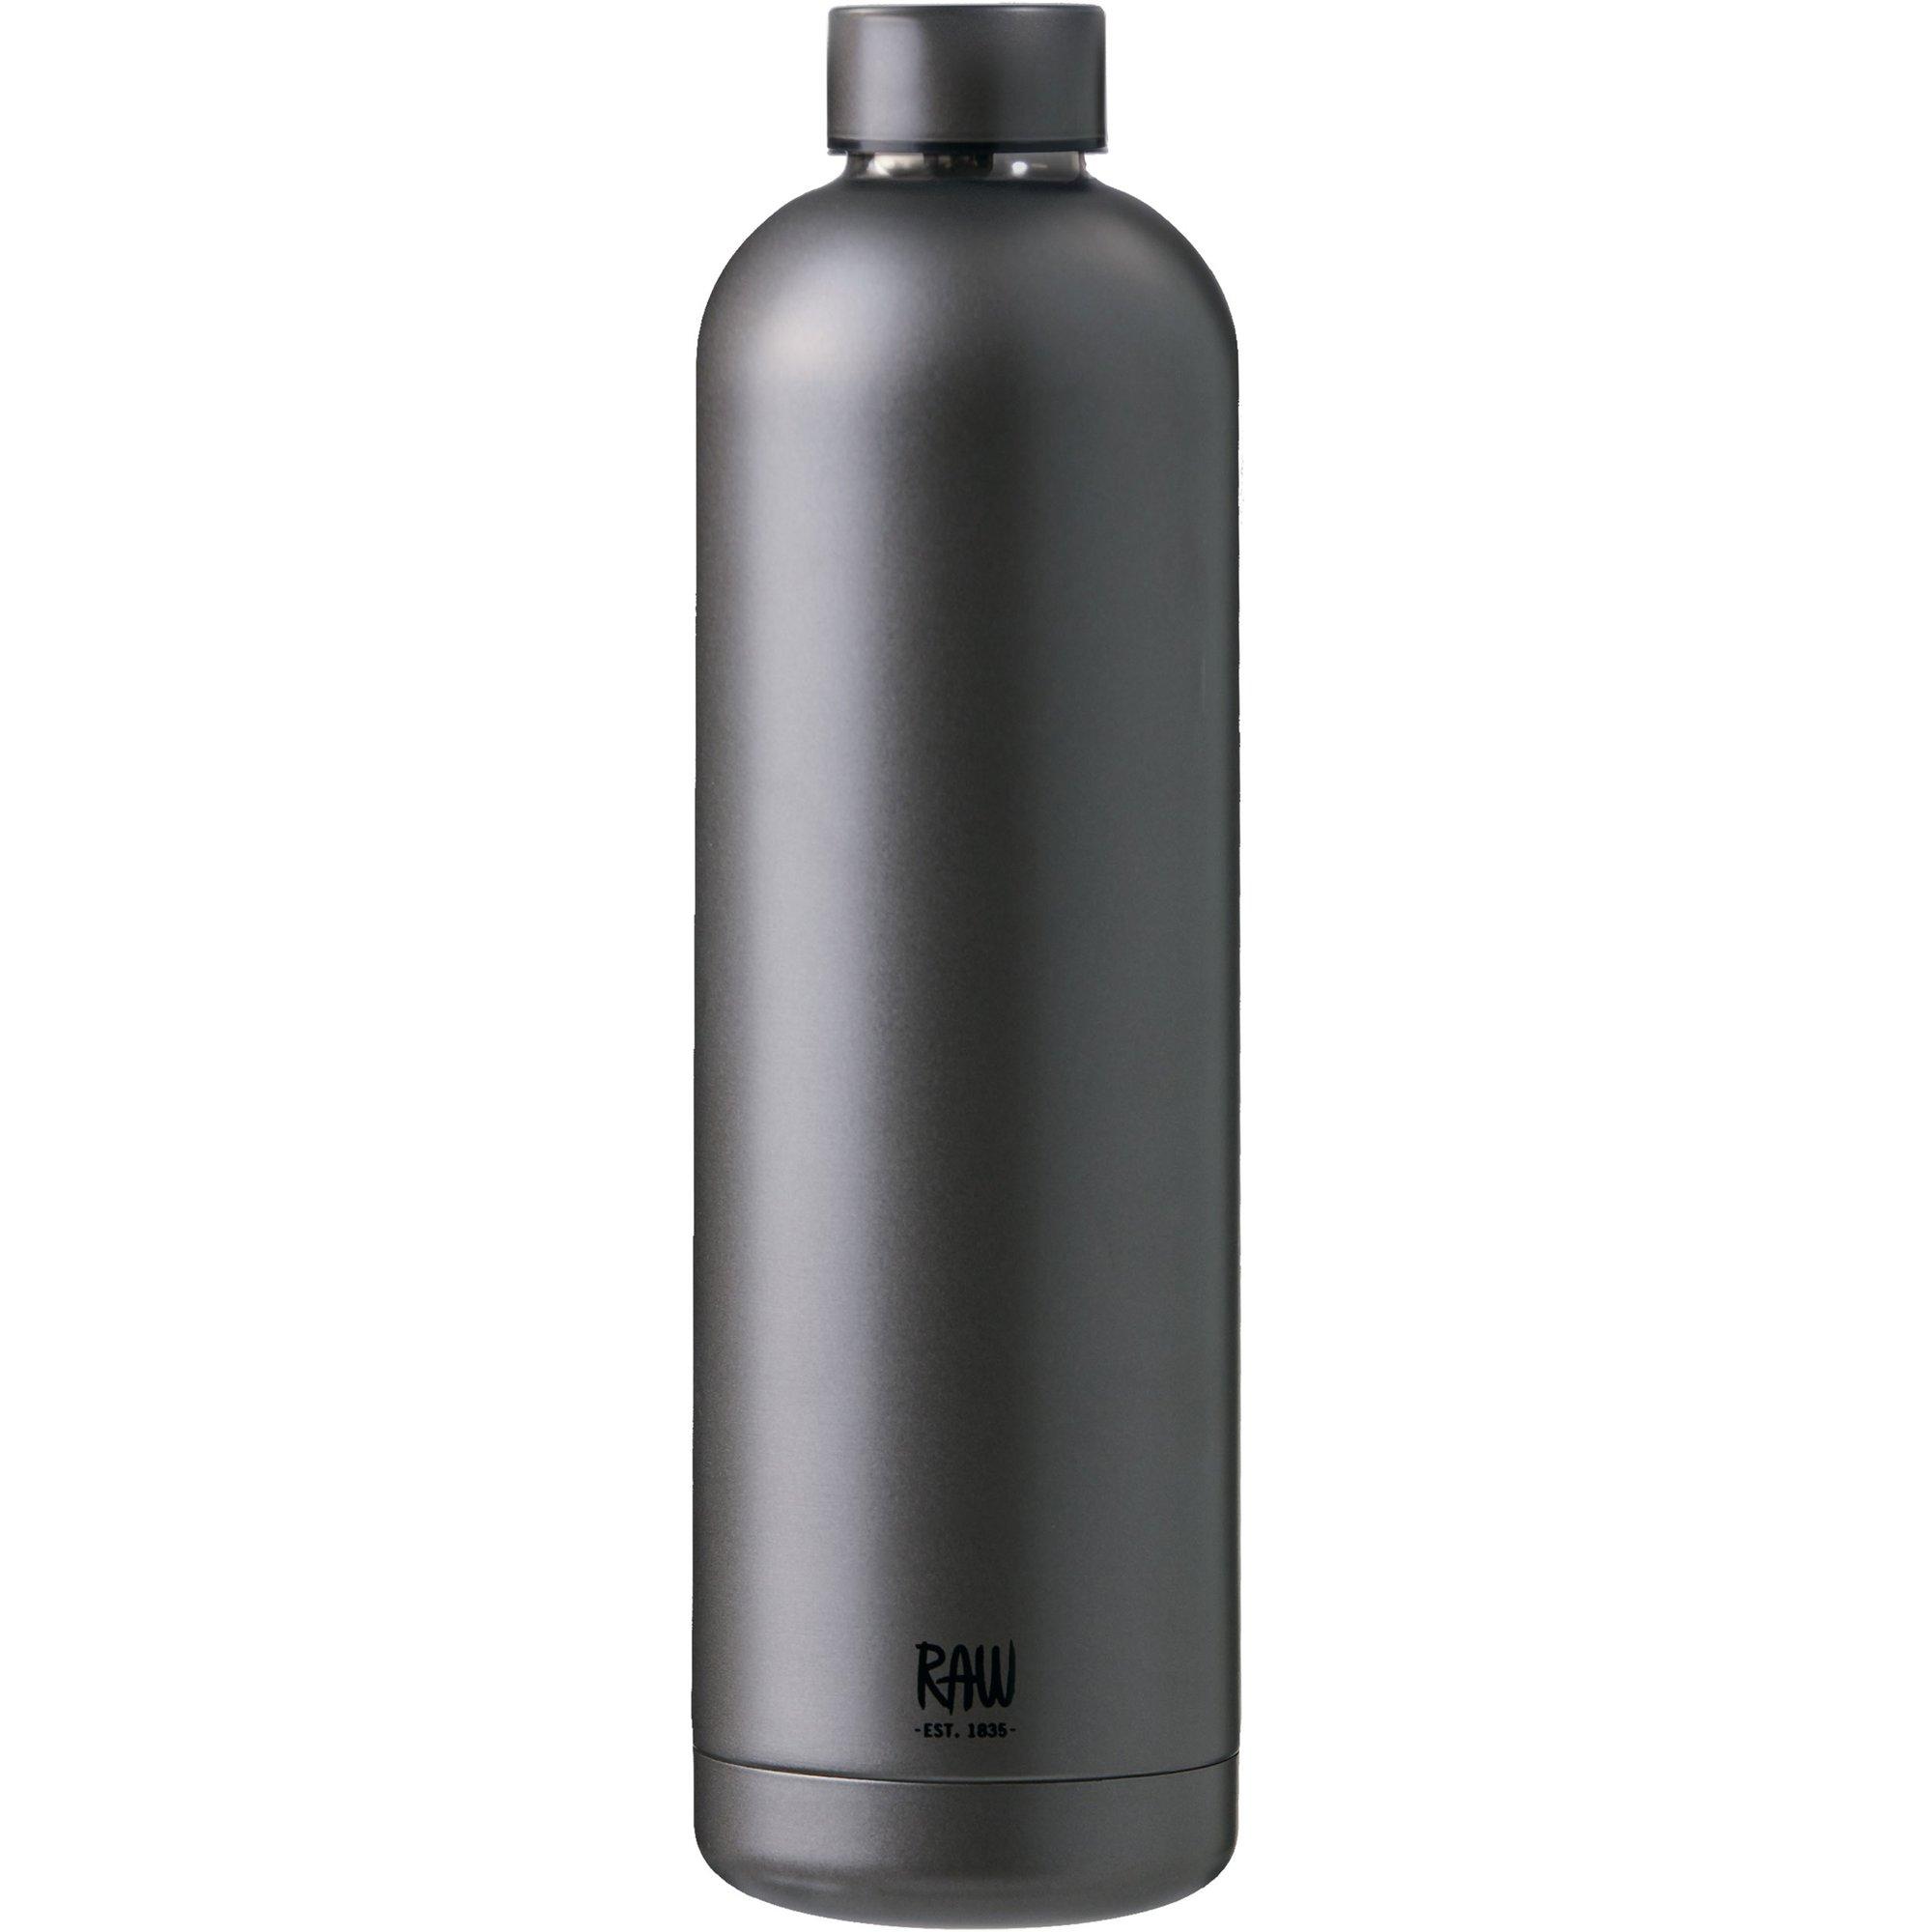 Aida RAW Termosflaska 1 liter Metallic Dark Grey